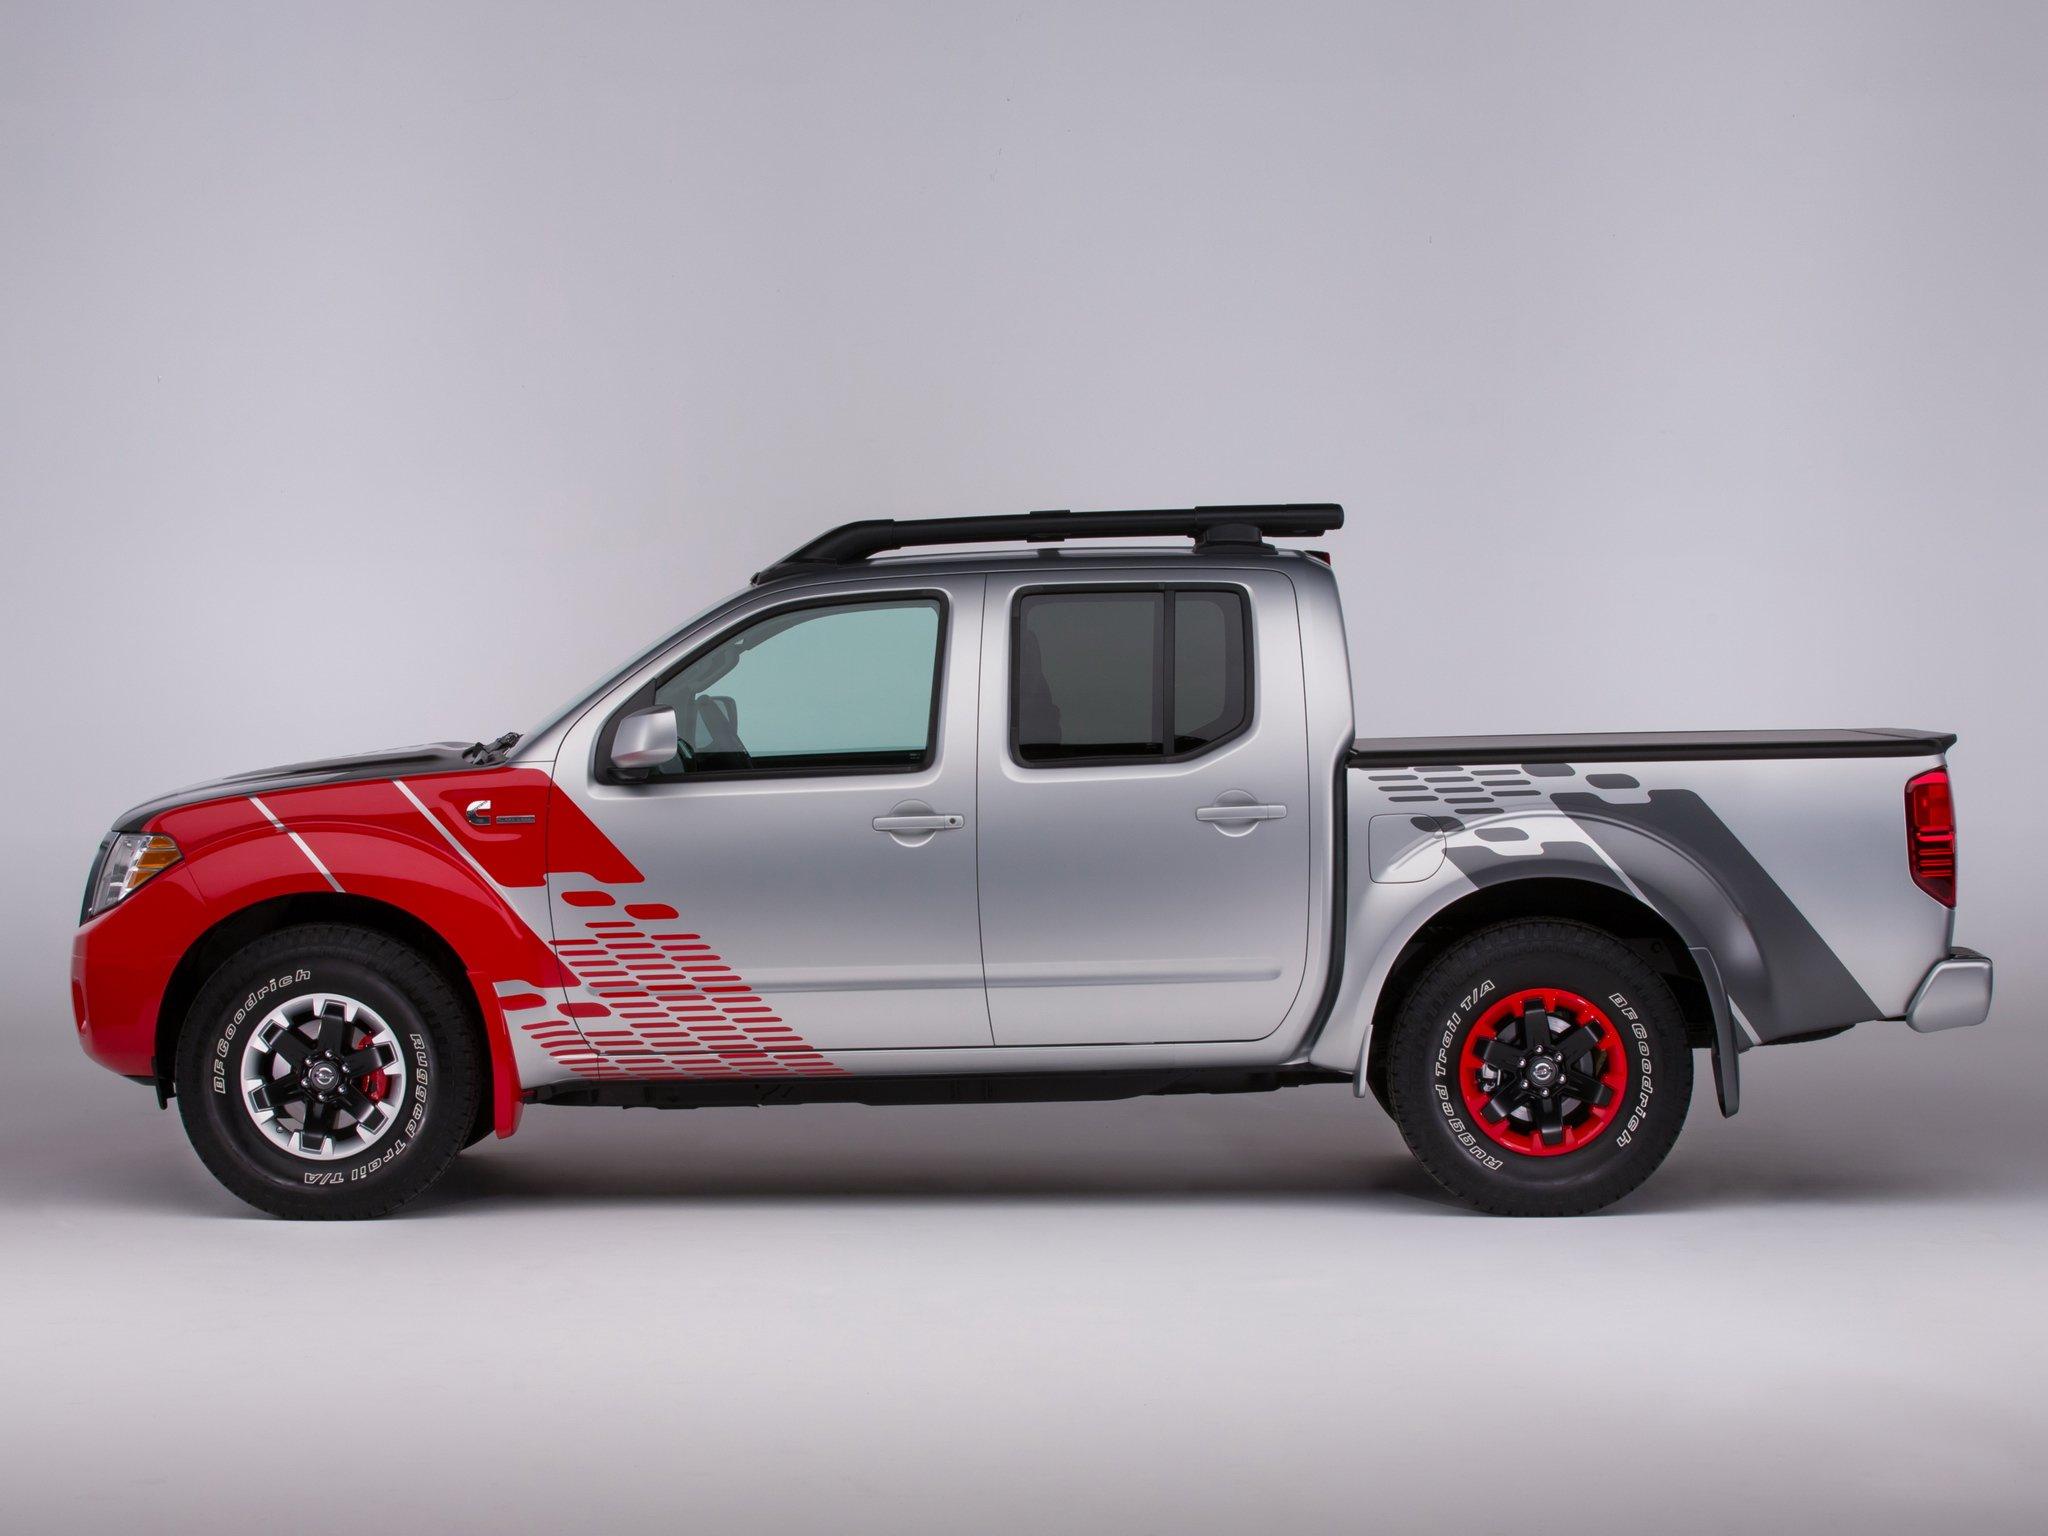 Nissan frontier diesel runner concept pickup r wallpaper background